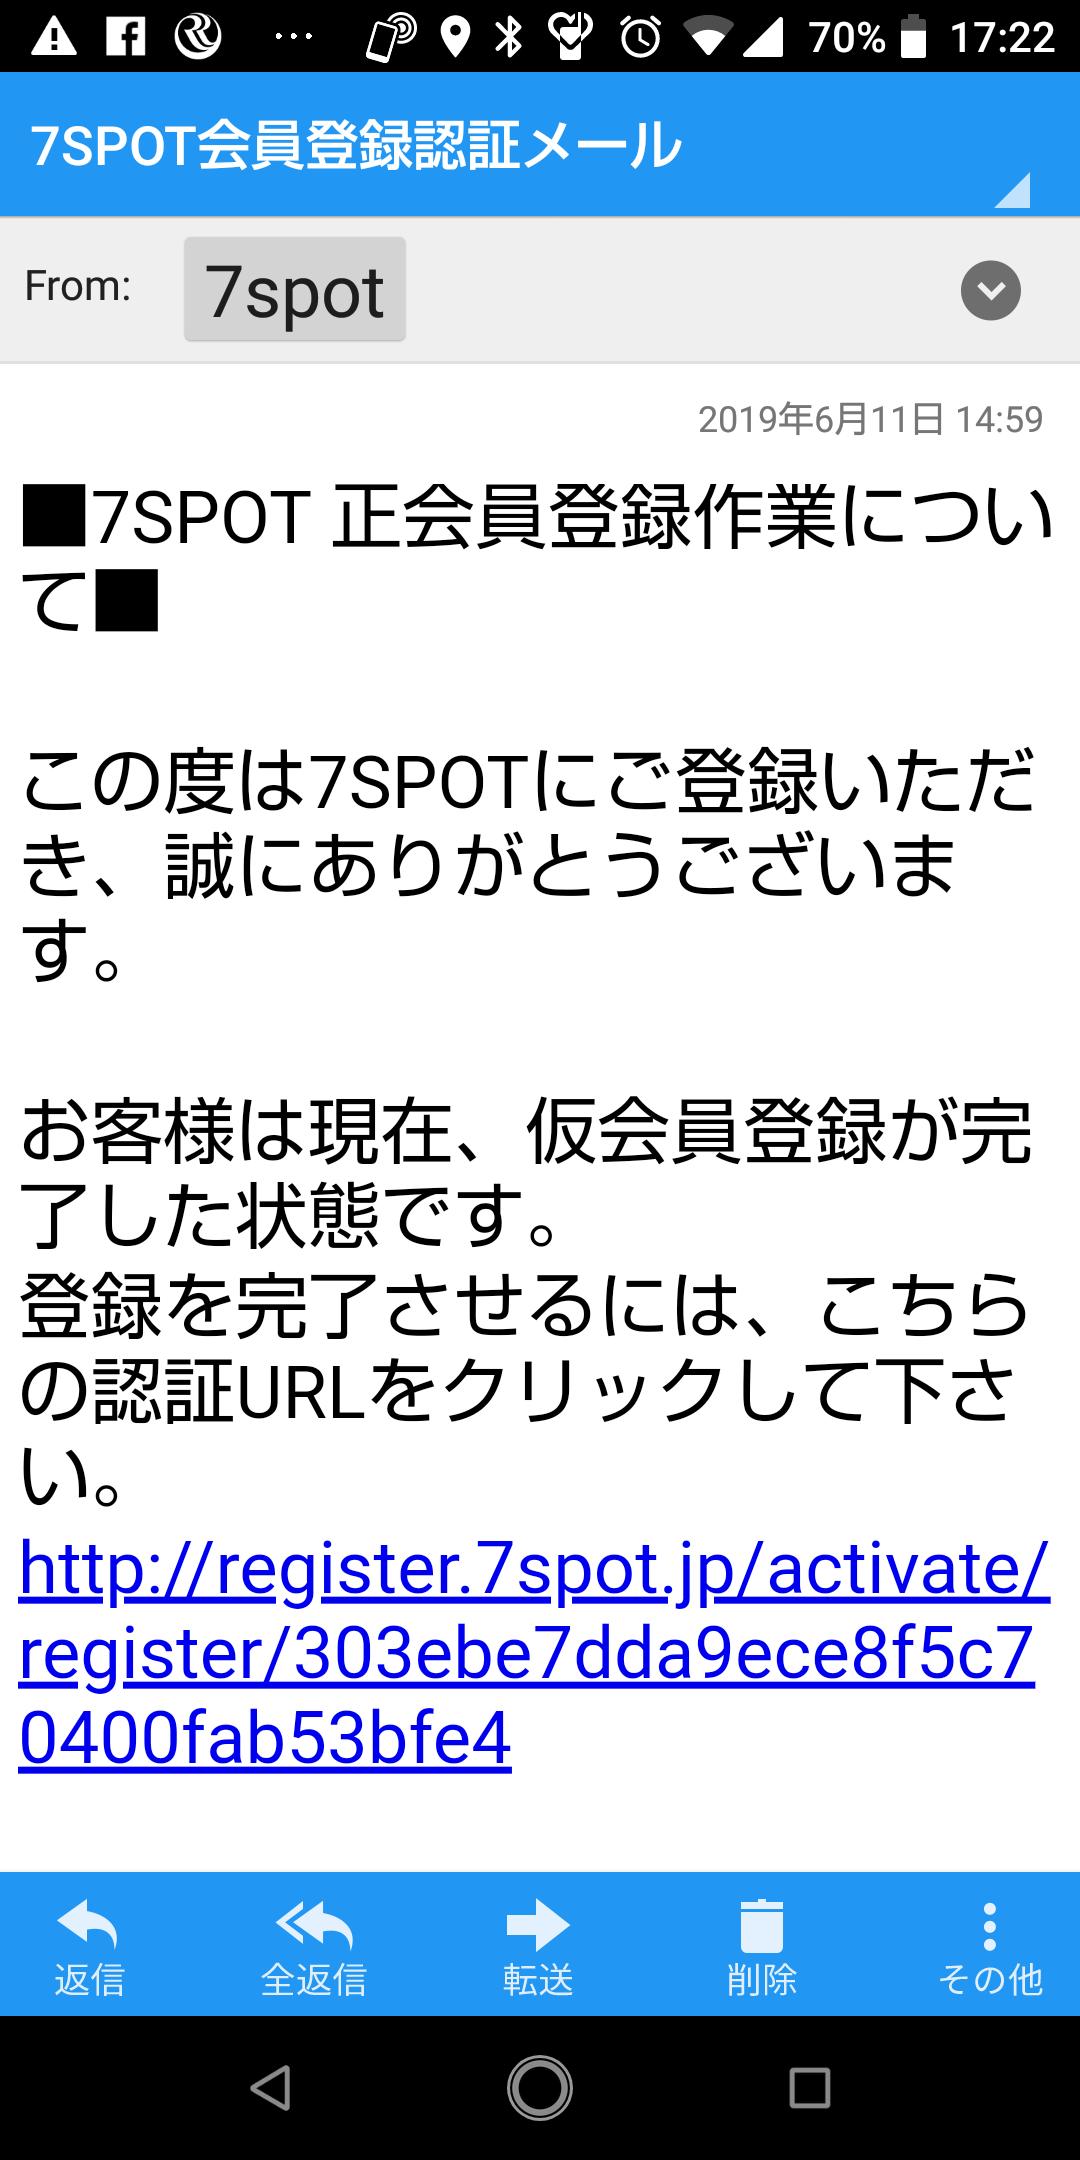 7SPOTに接続